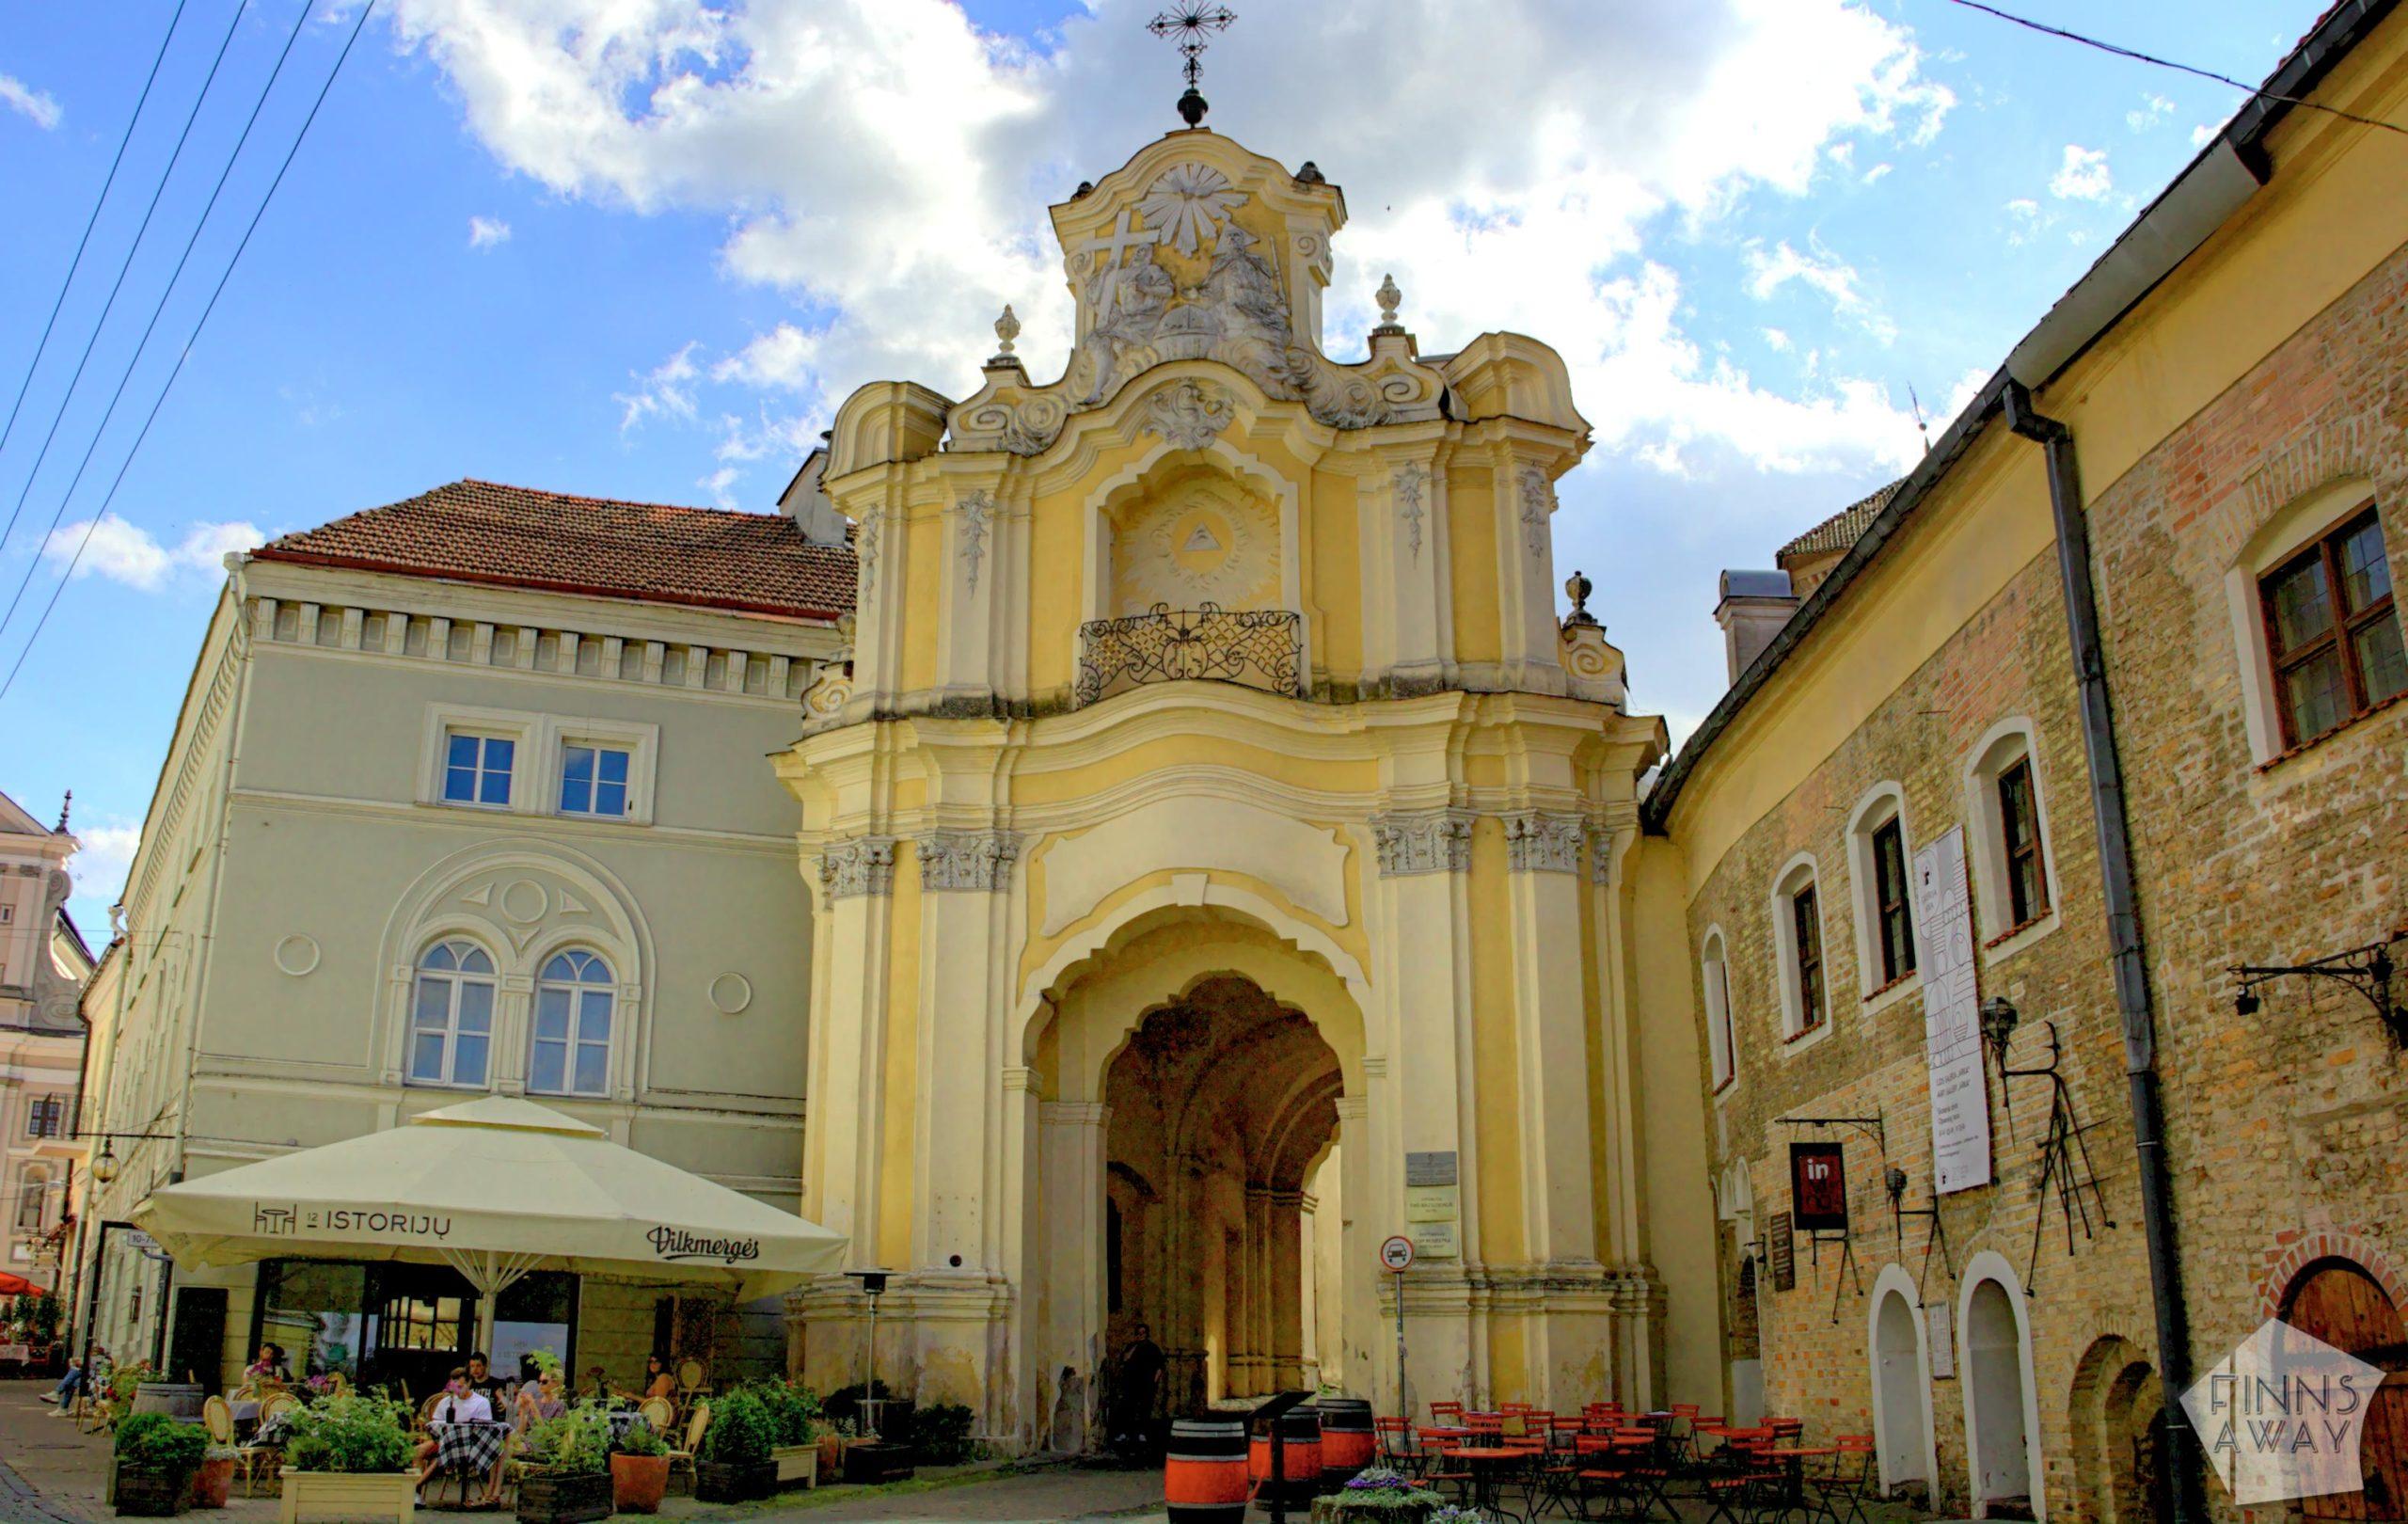 Basilian Gate, the Monastery and Church of the Holy Trinity | FinnsAway Travel Blog